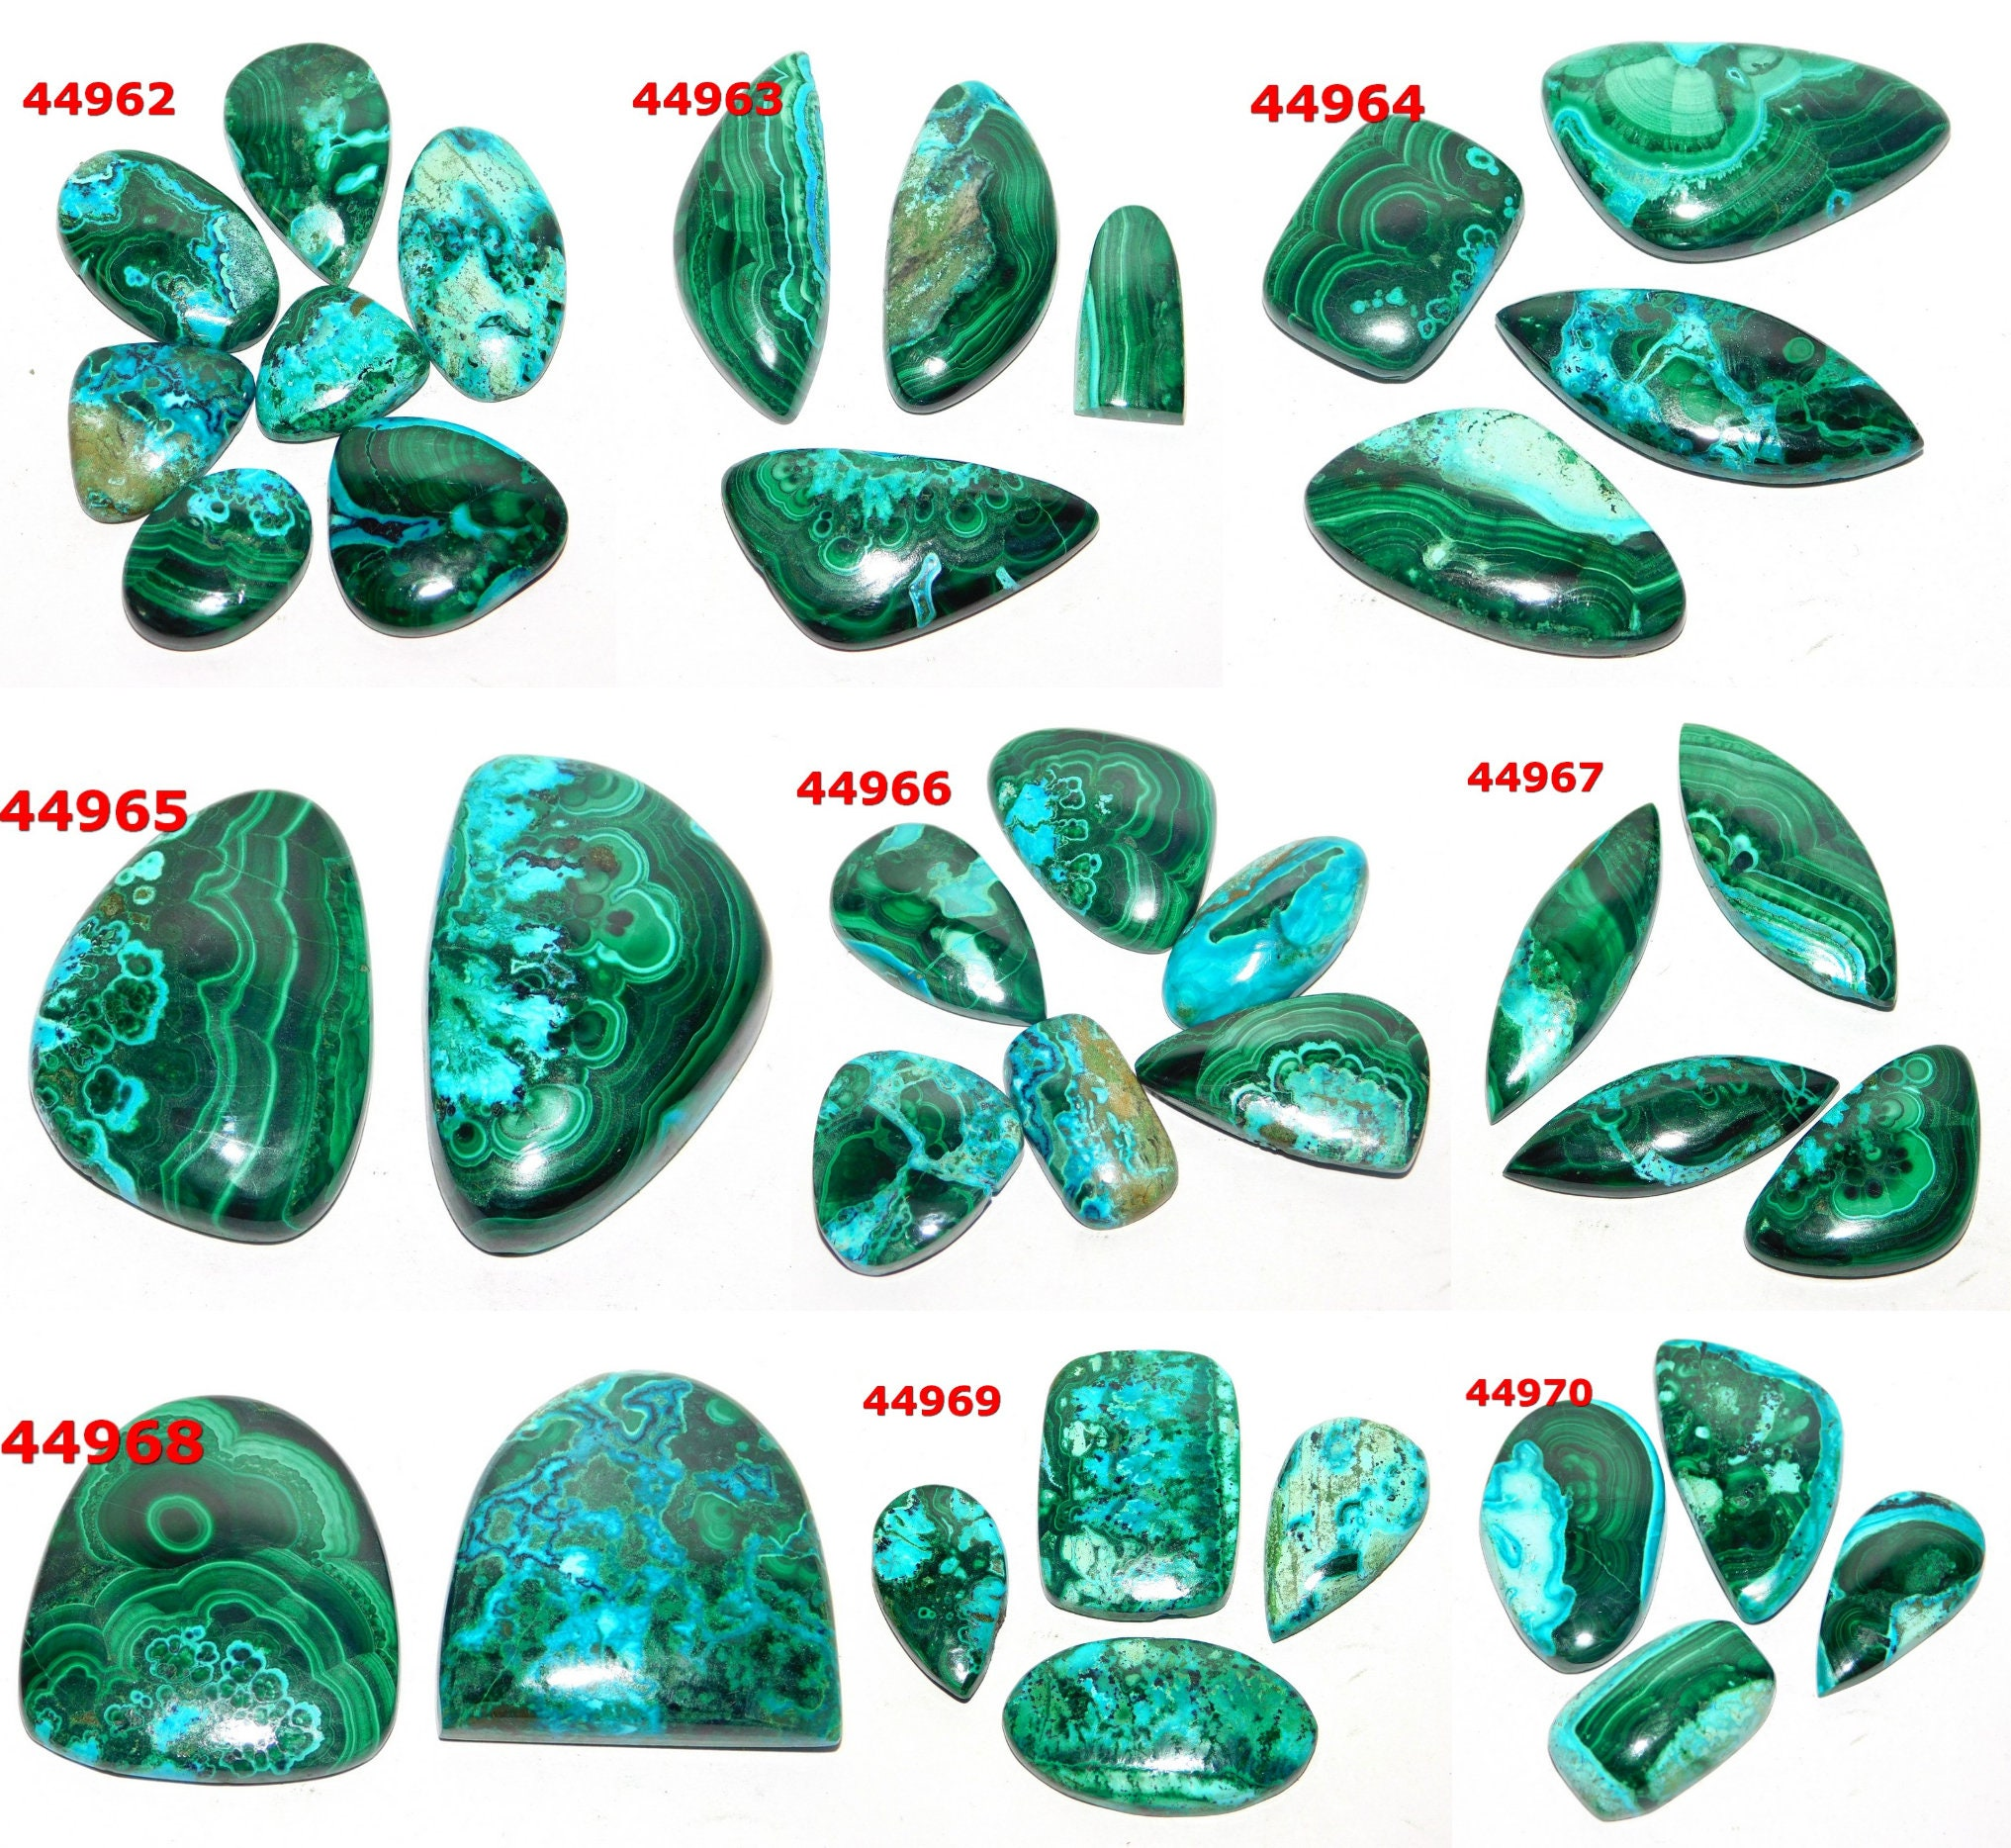 AAA+ 100% Natural Spectacuar Azurite Malachite gemstone Very smooth Azurite Malachite loose stone top look Azurite Malachite cabochon stone